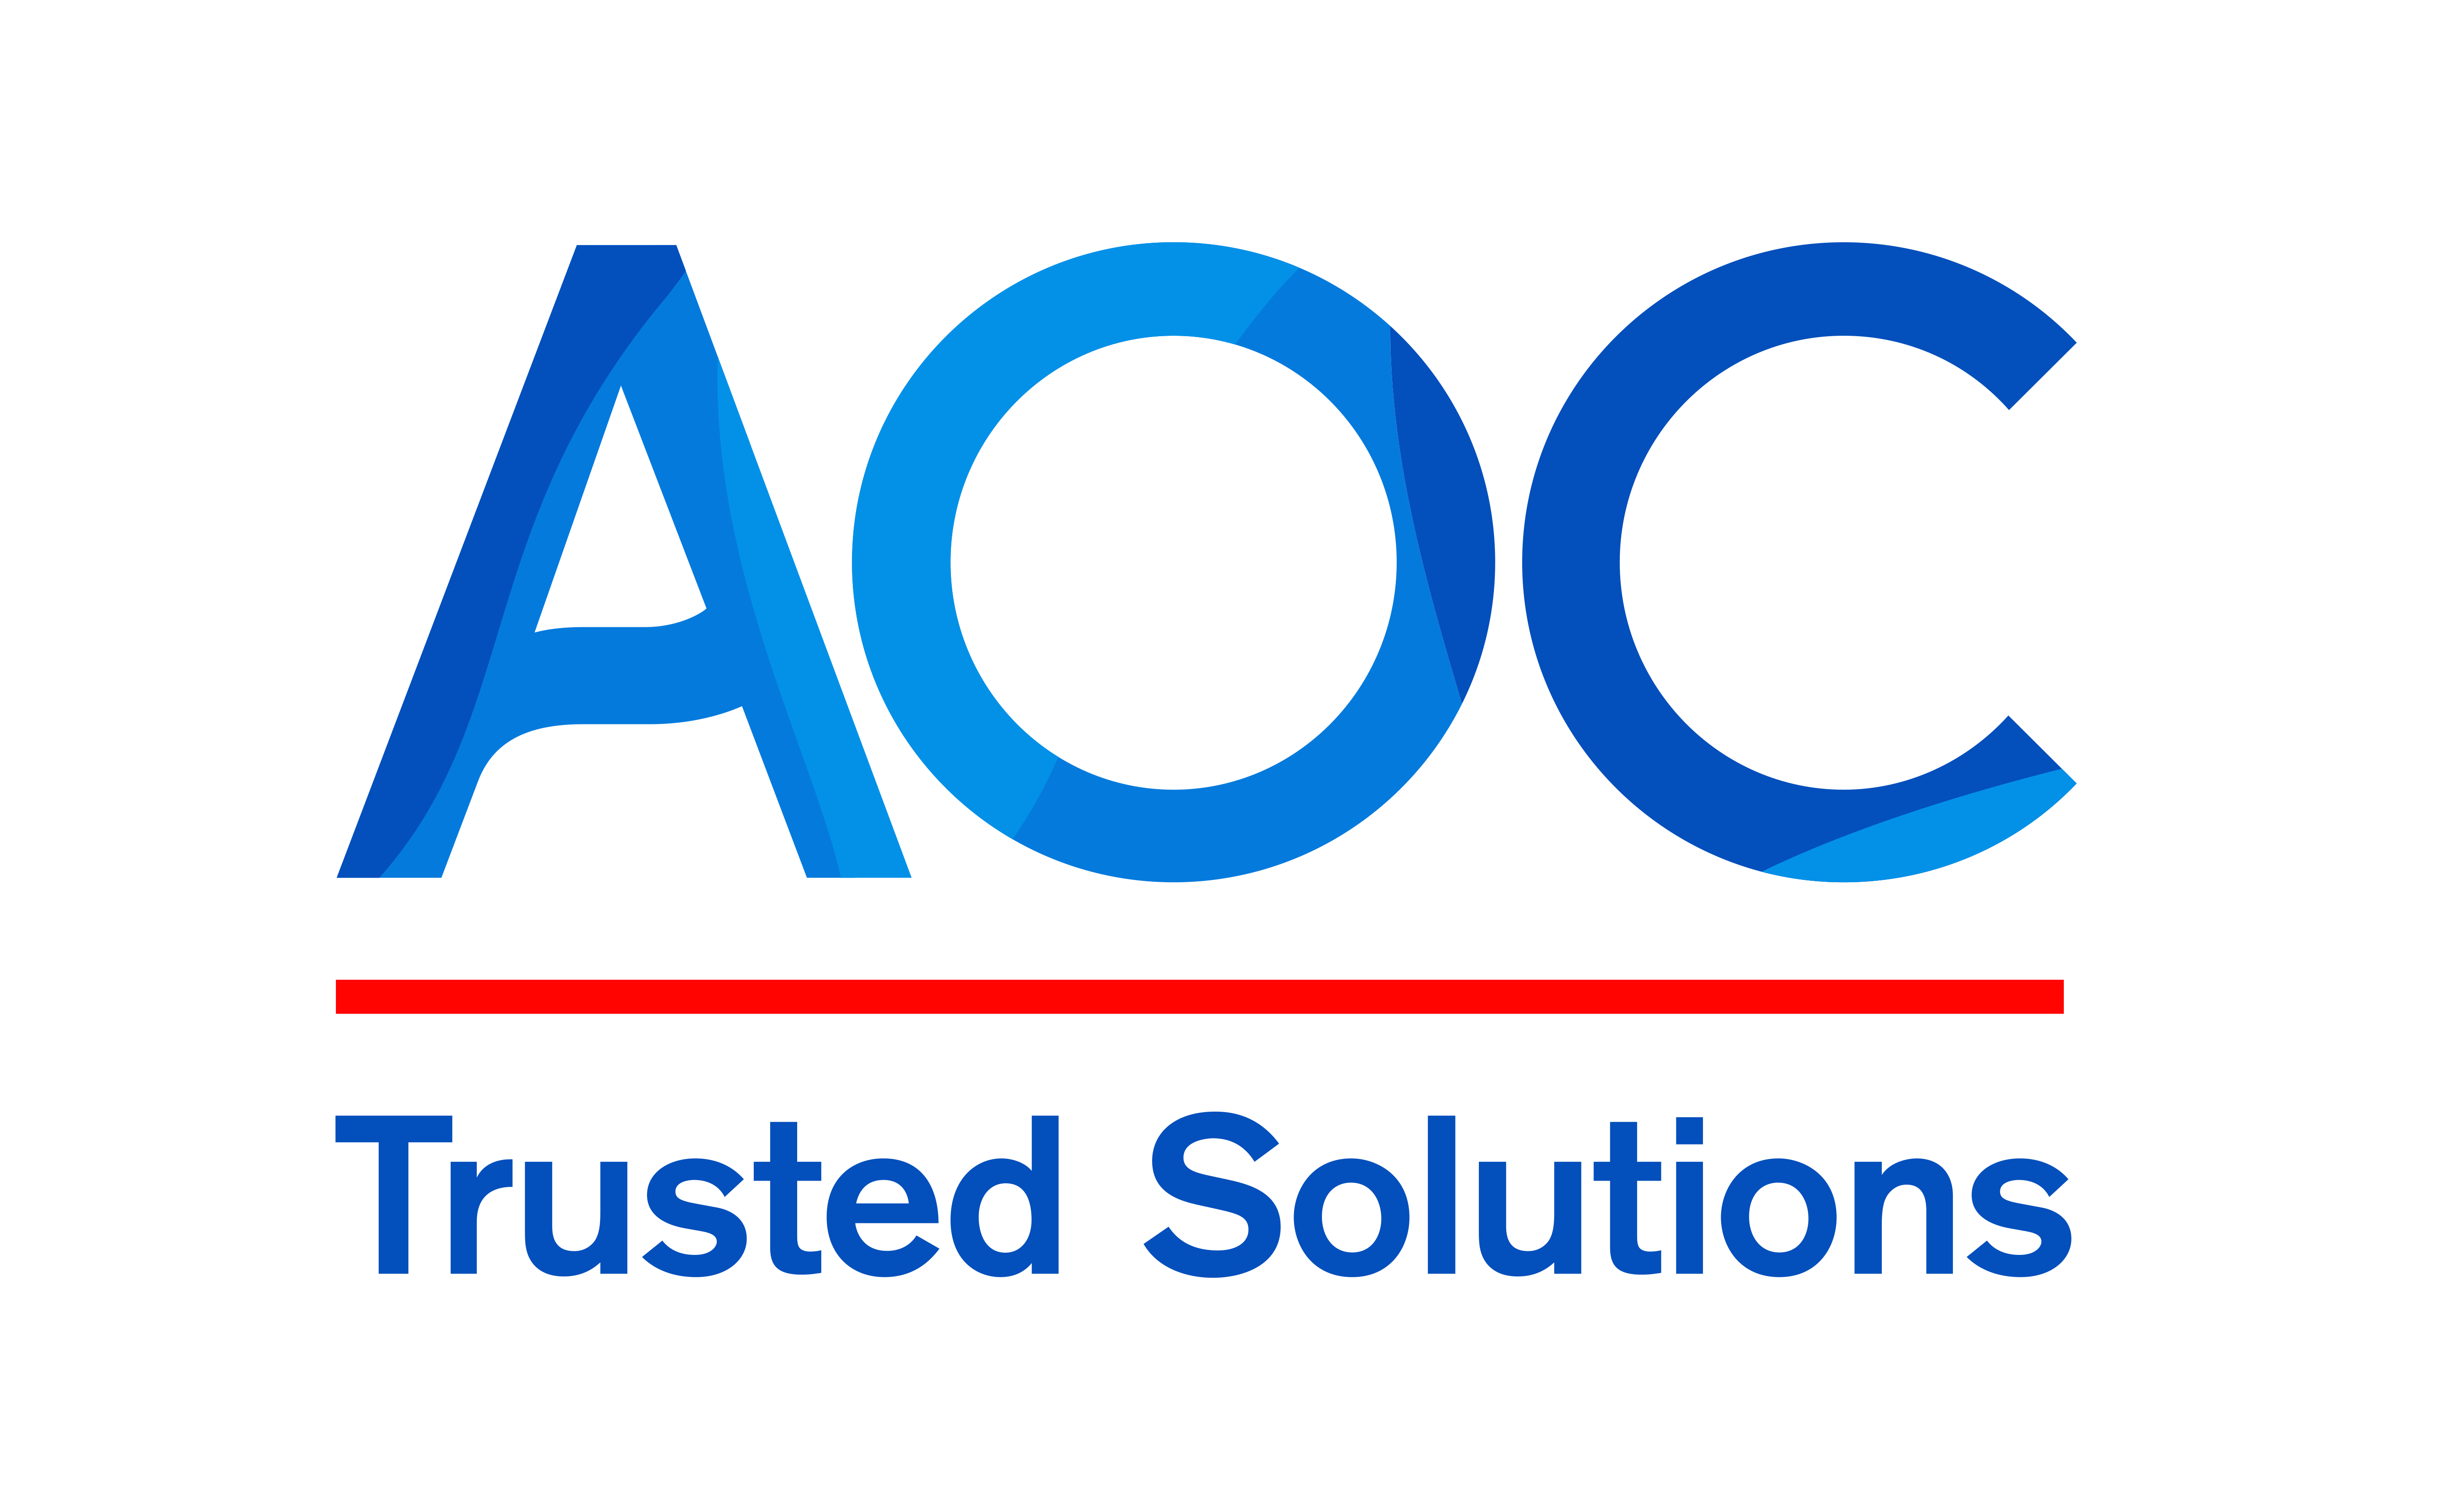 AOC Nederland logo